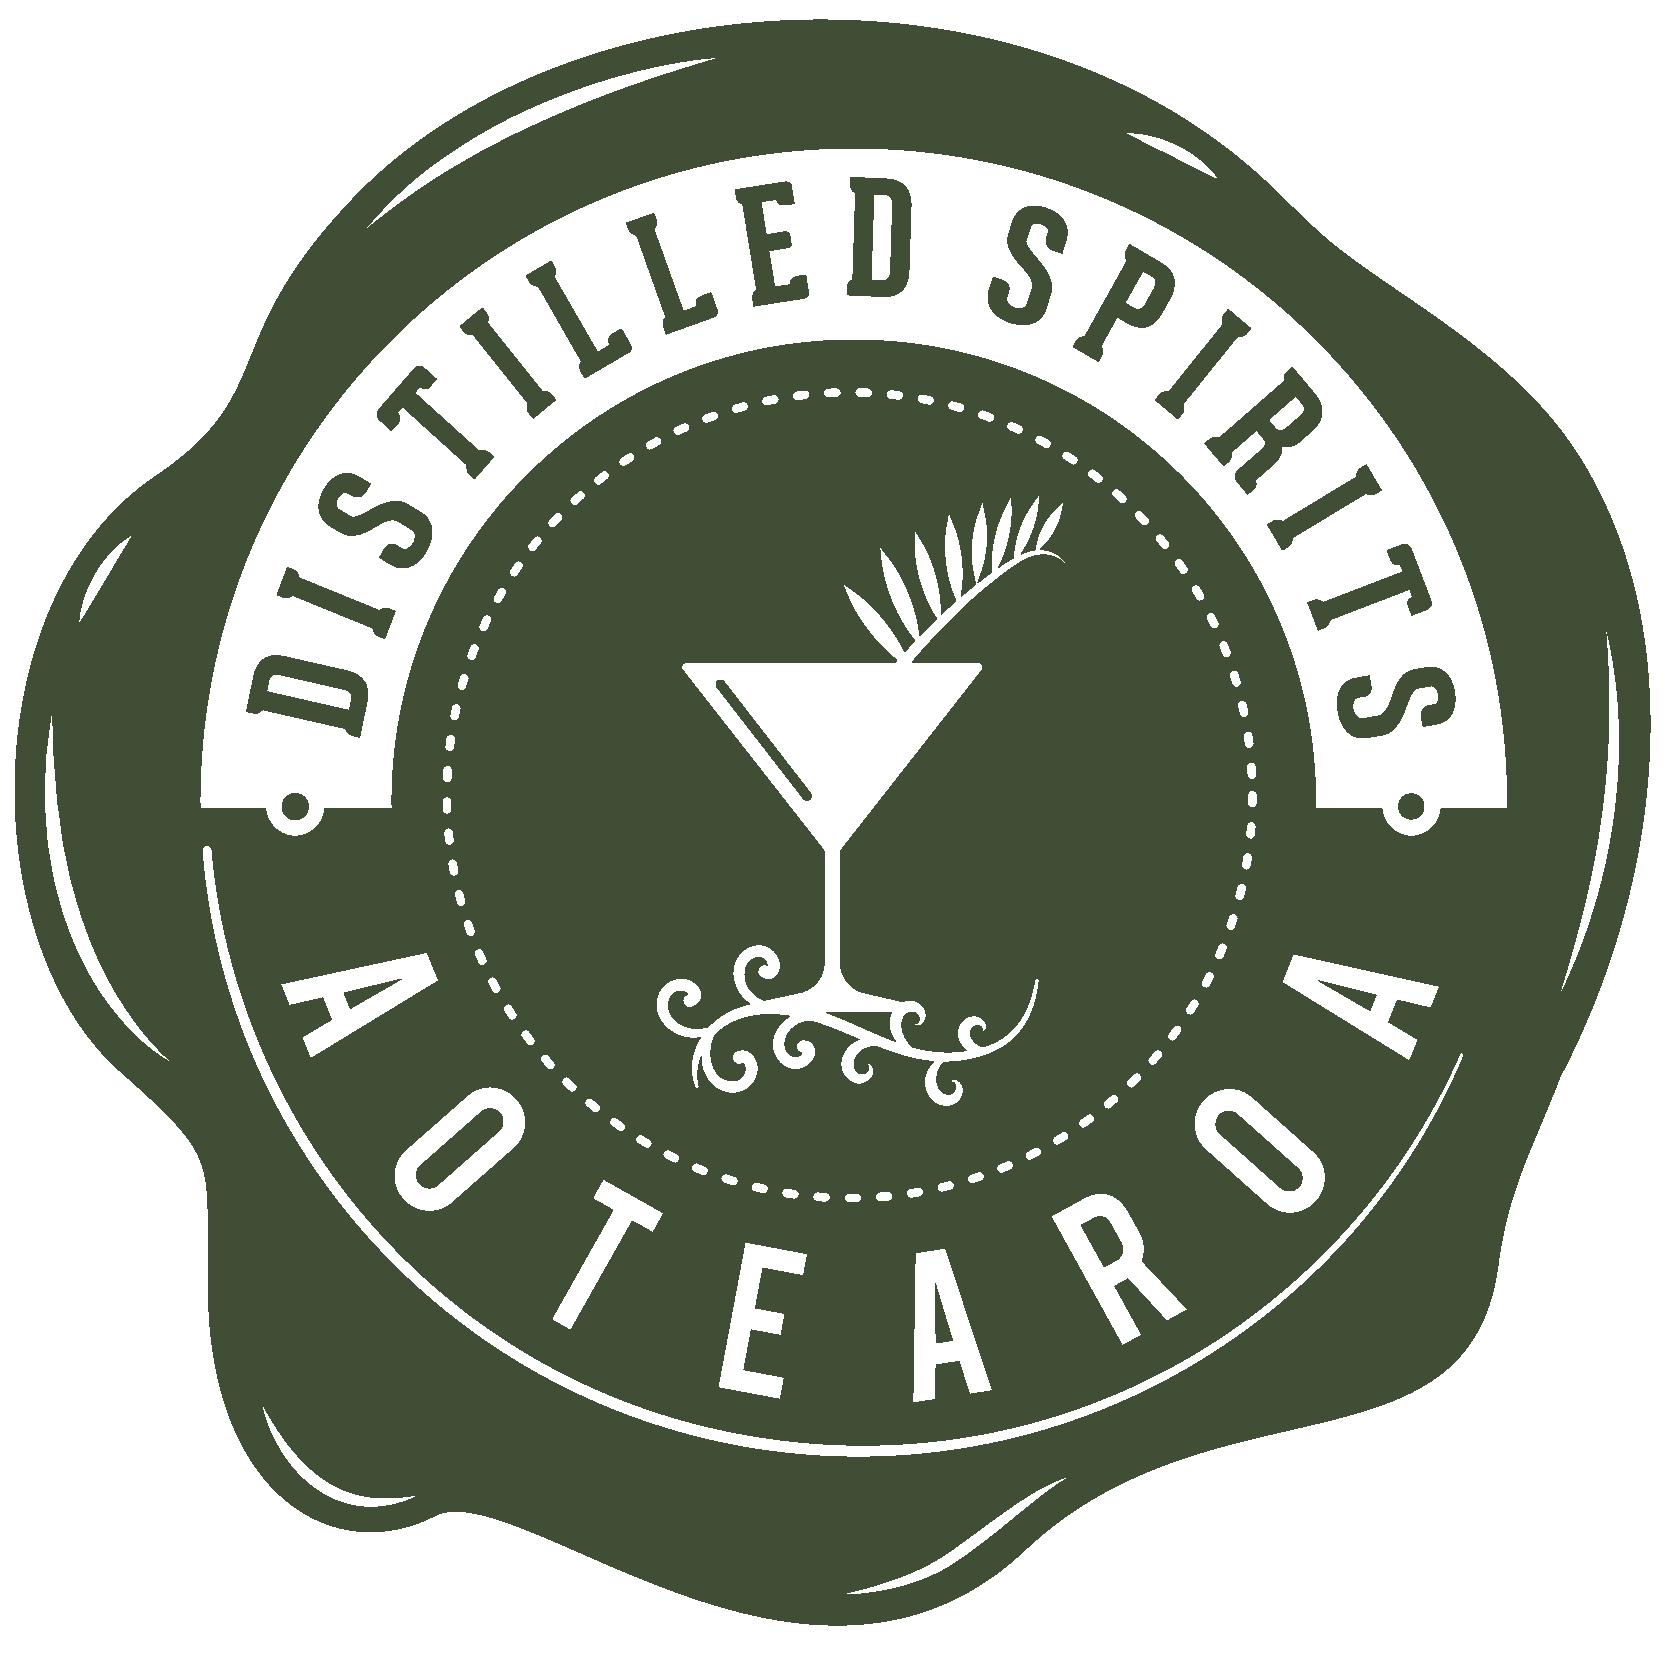 Distilled Spirits Aotearoa